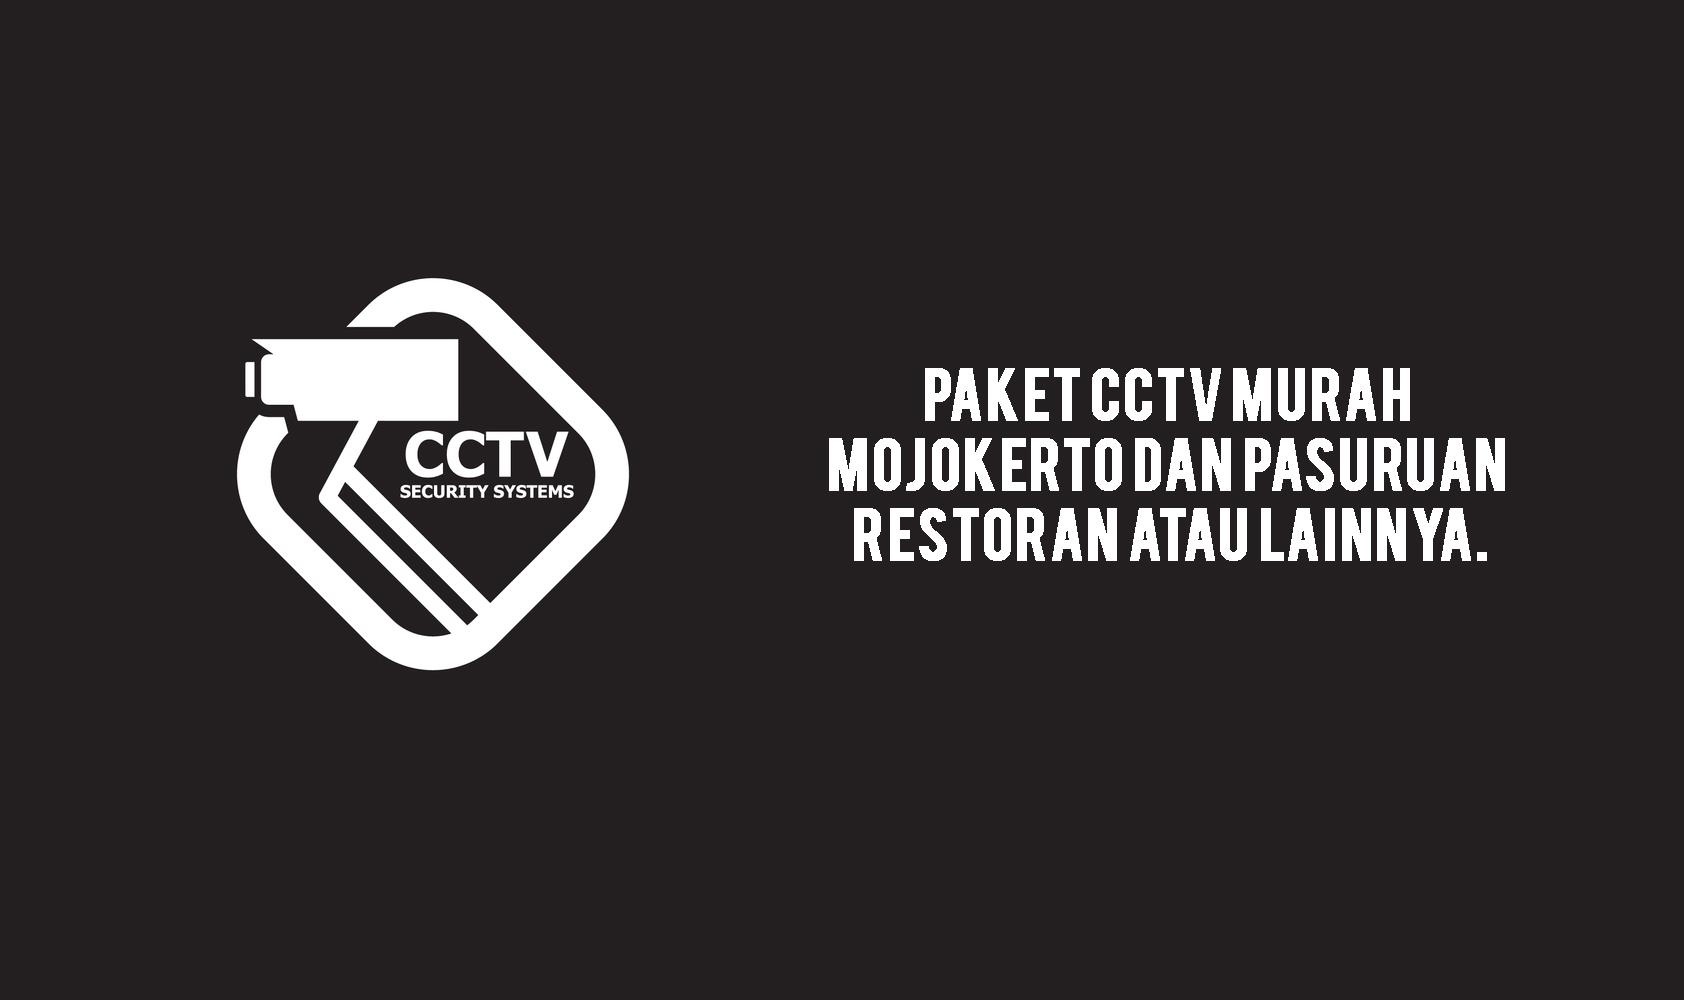 Paket-CCTV-murah-pasuruan-dan-mojokerto-229287